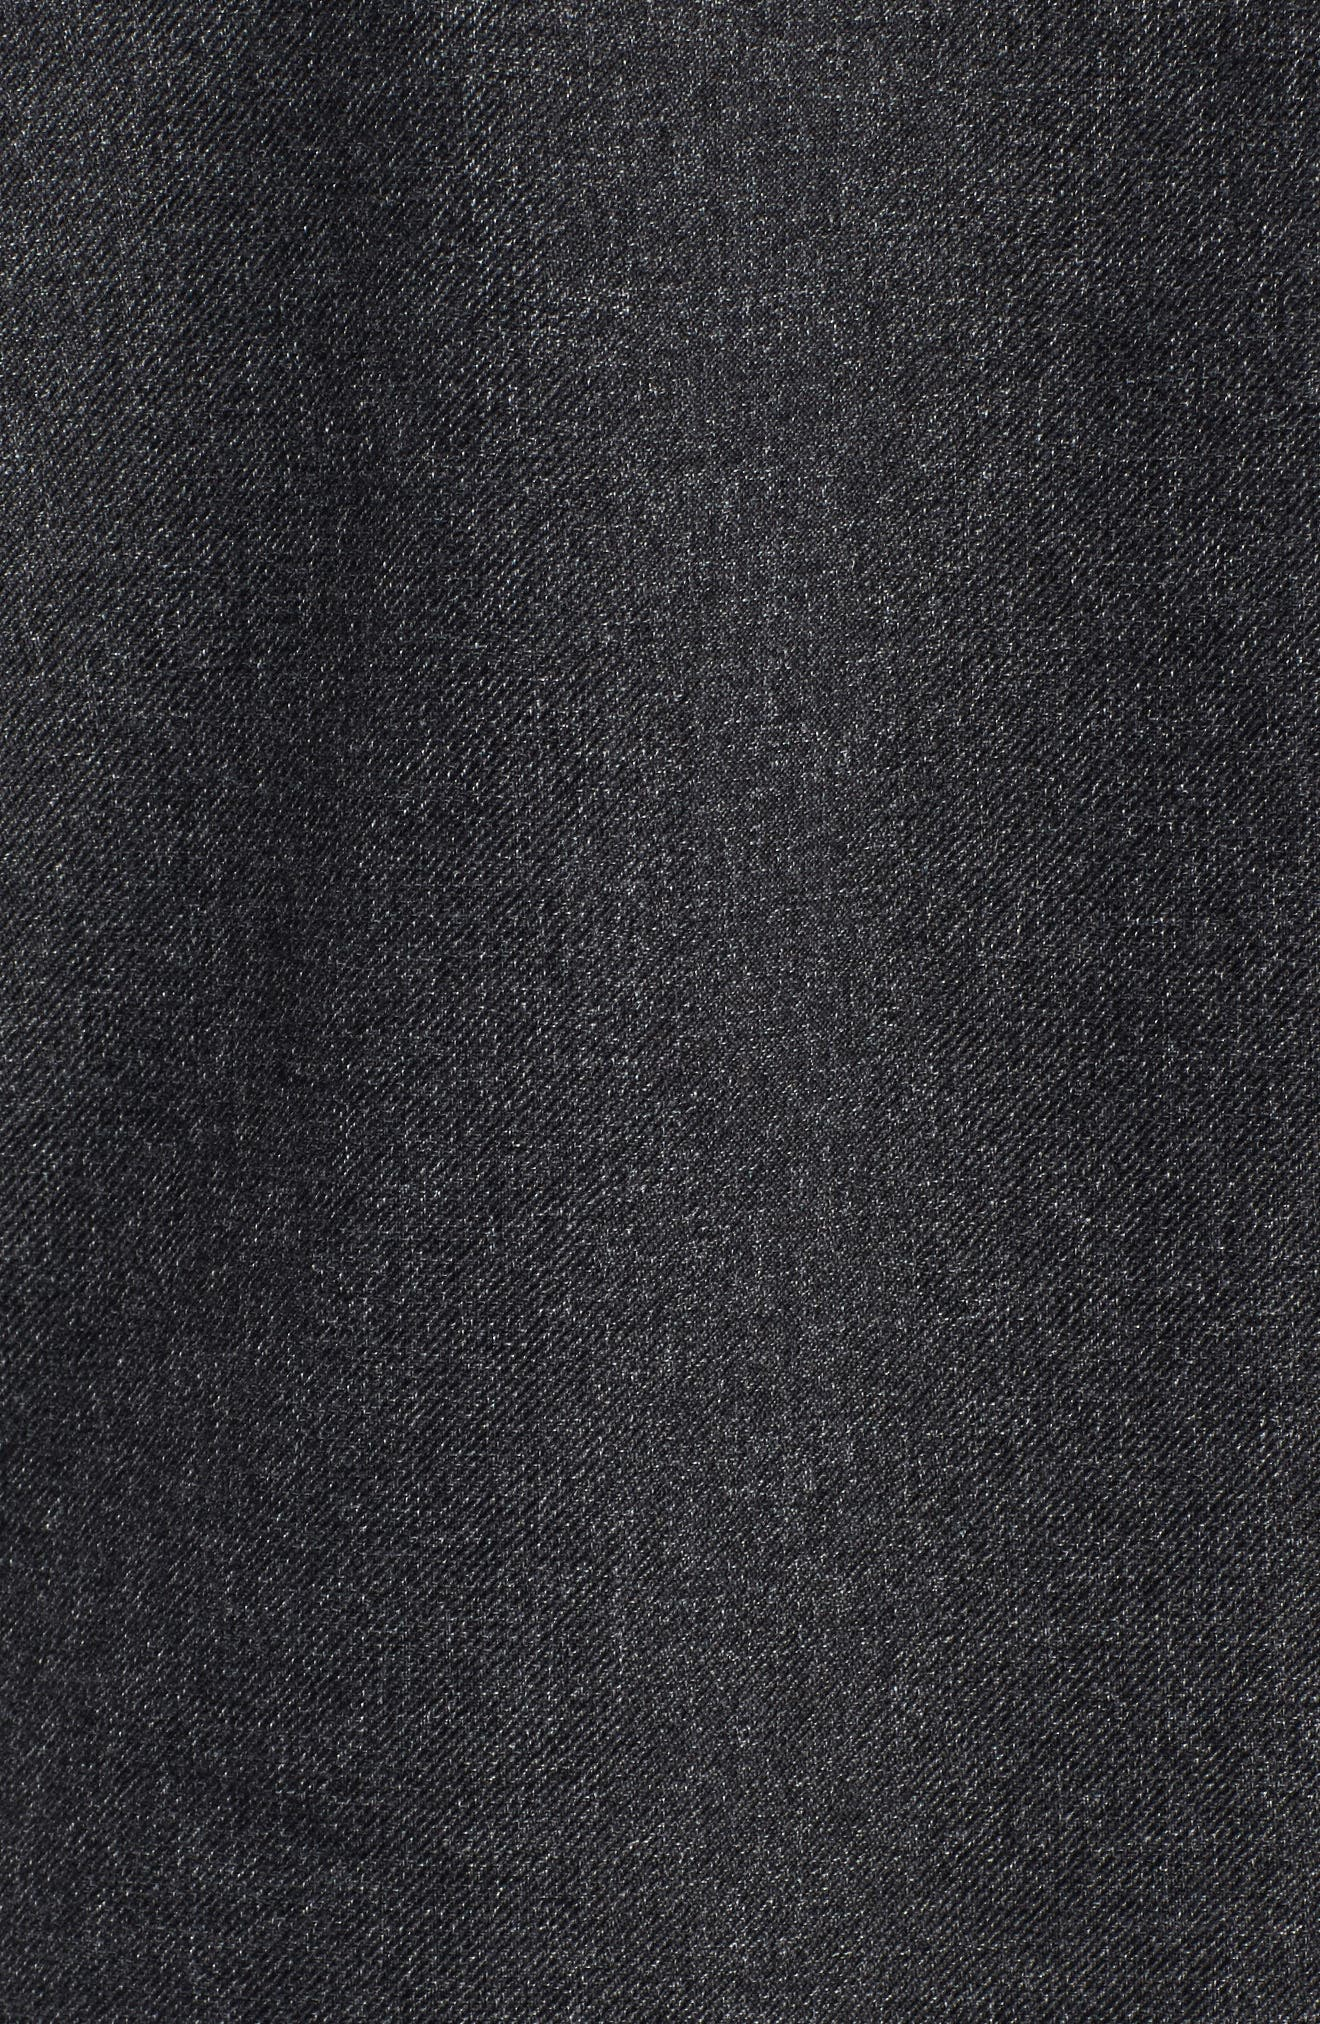 Kassler DryVent Field Jacket,                             Alternate thumbnail 6, color,                             001